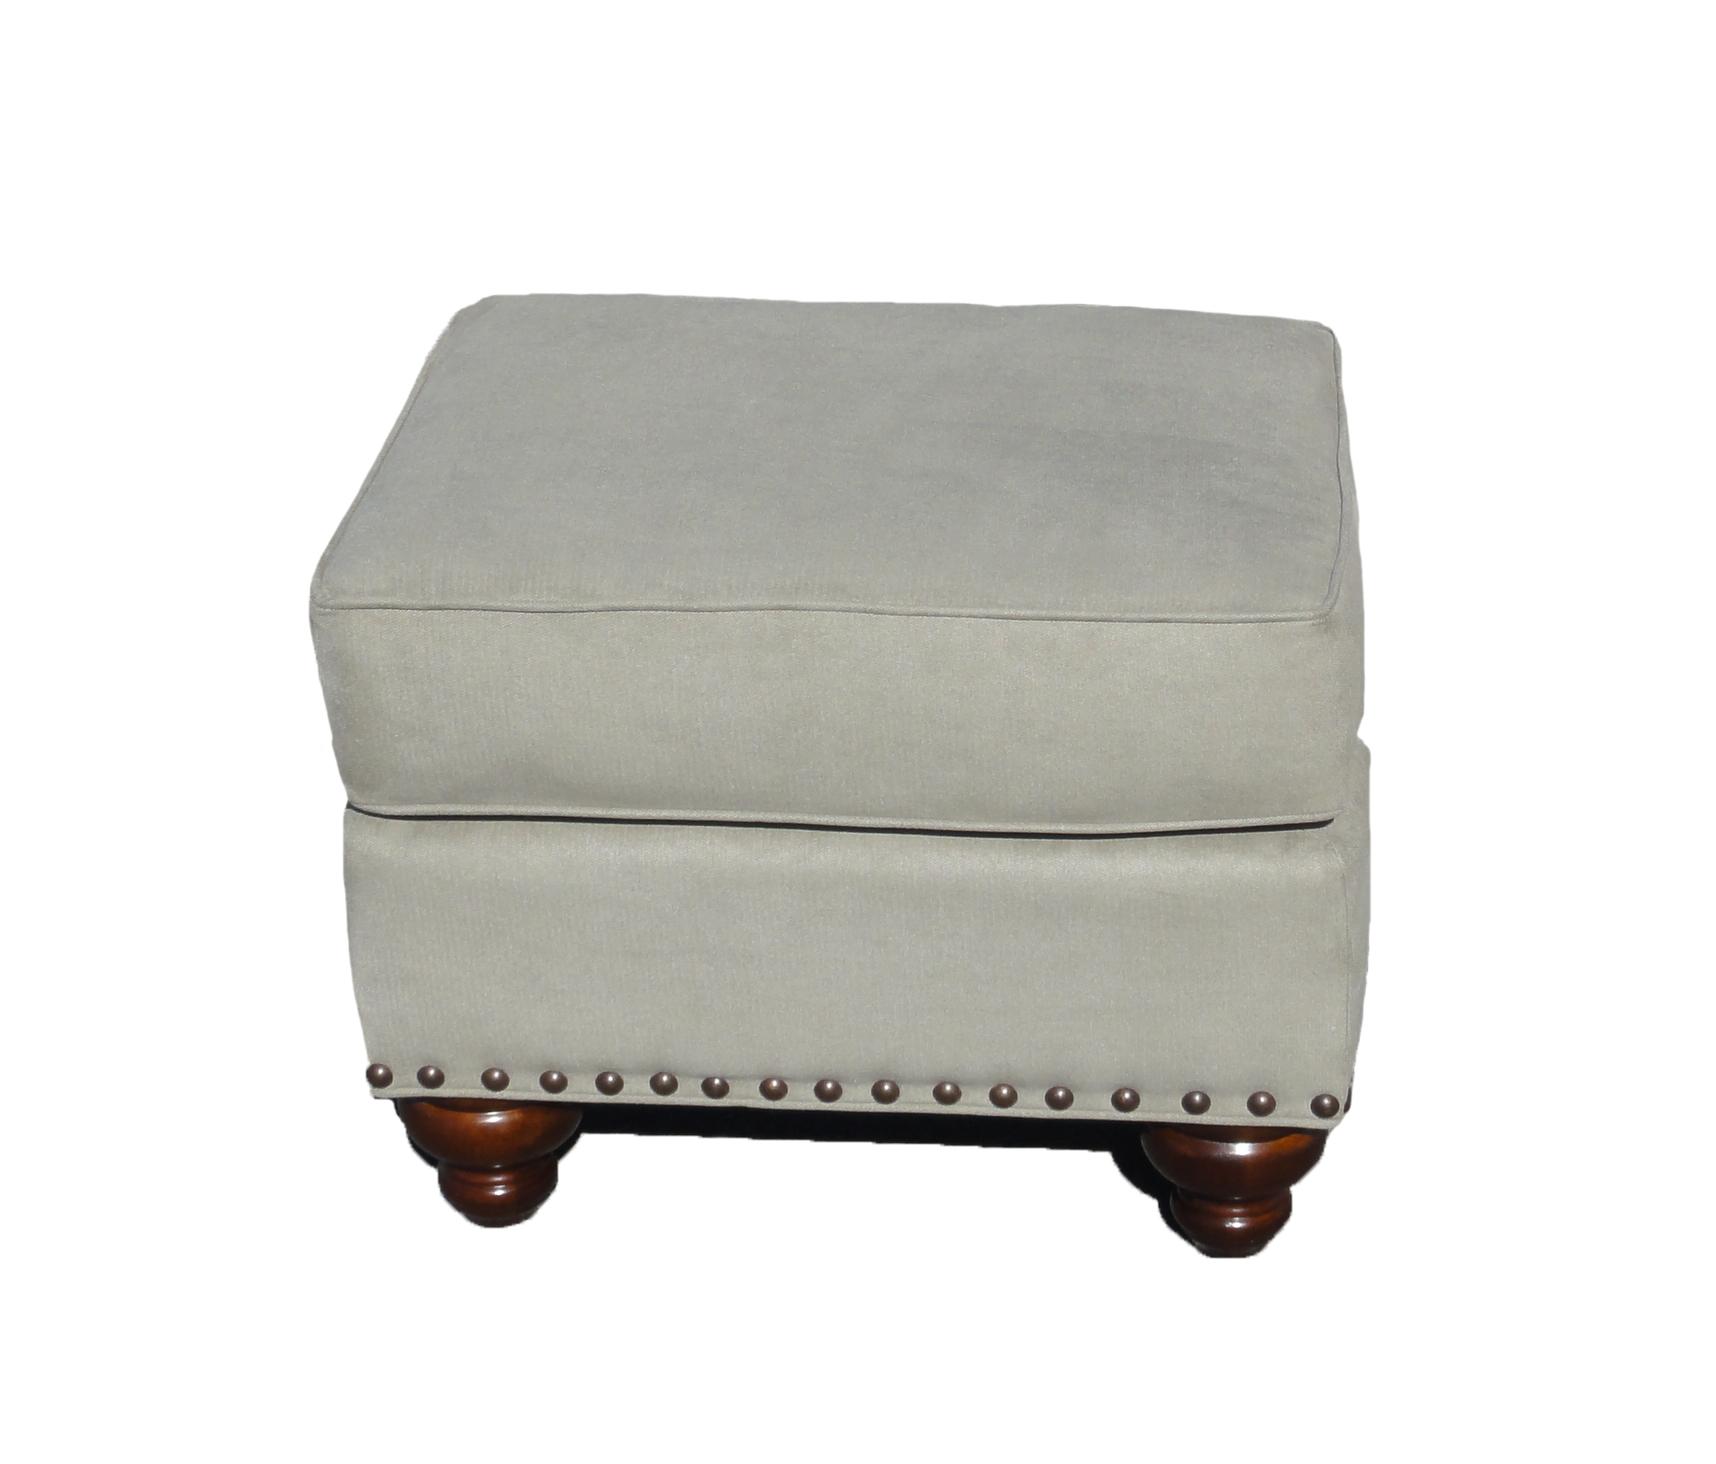 Merkur Ottoman santa barbara design center rugs and more oriental carpet couch sofa sectional 1